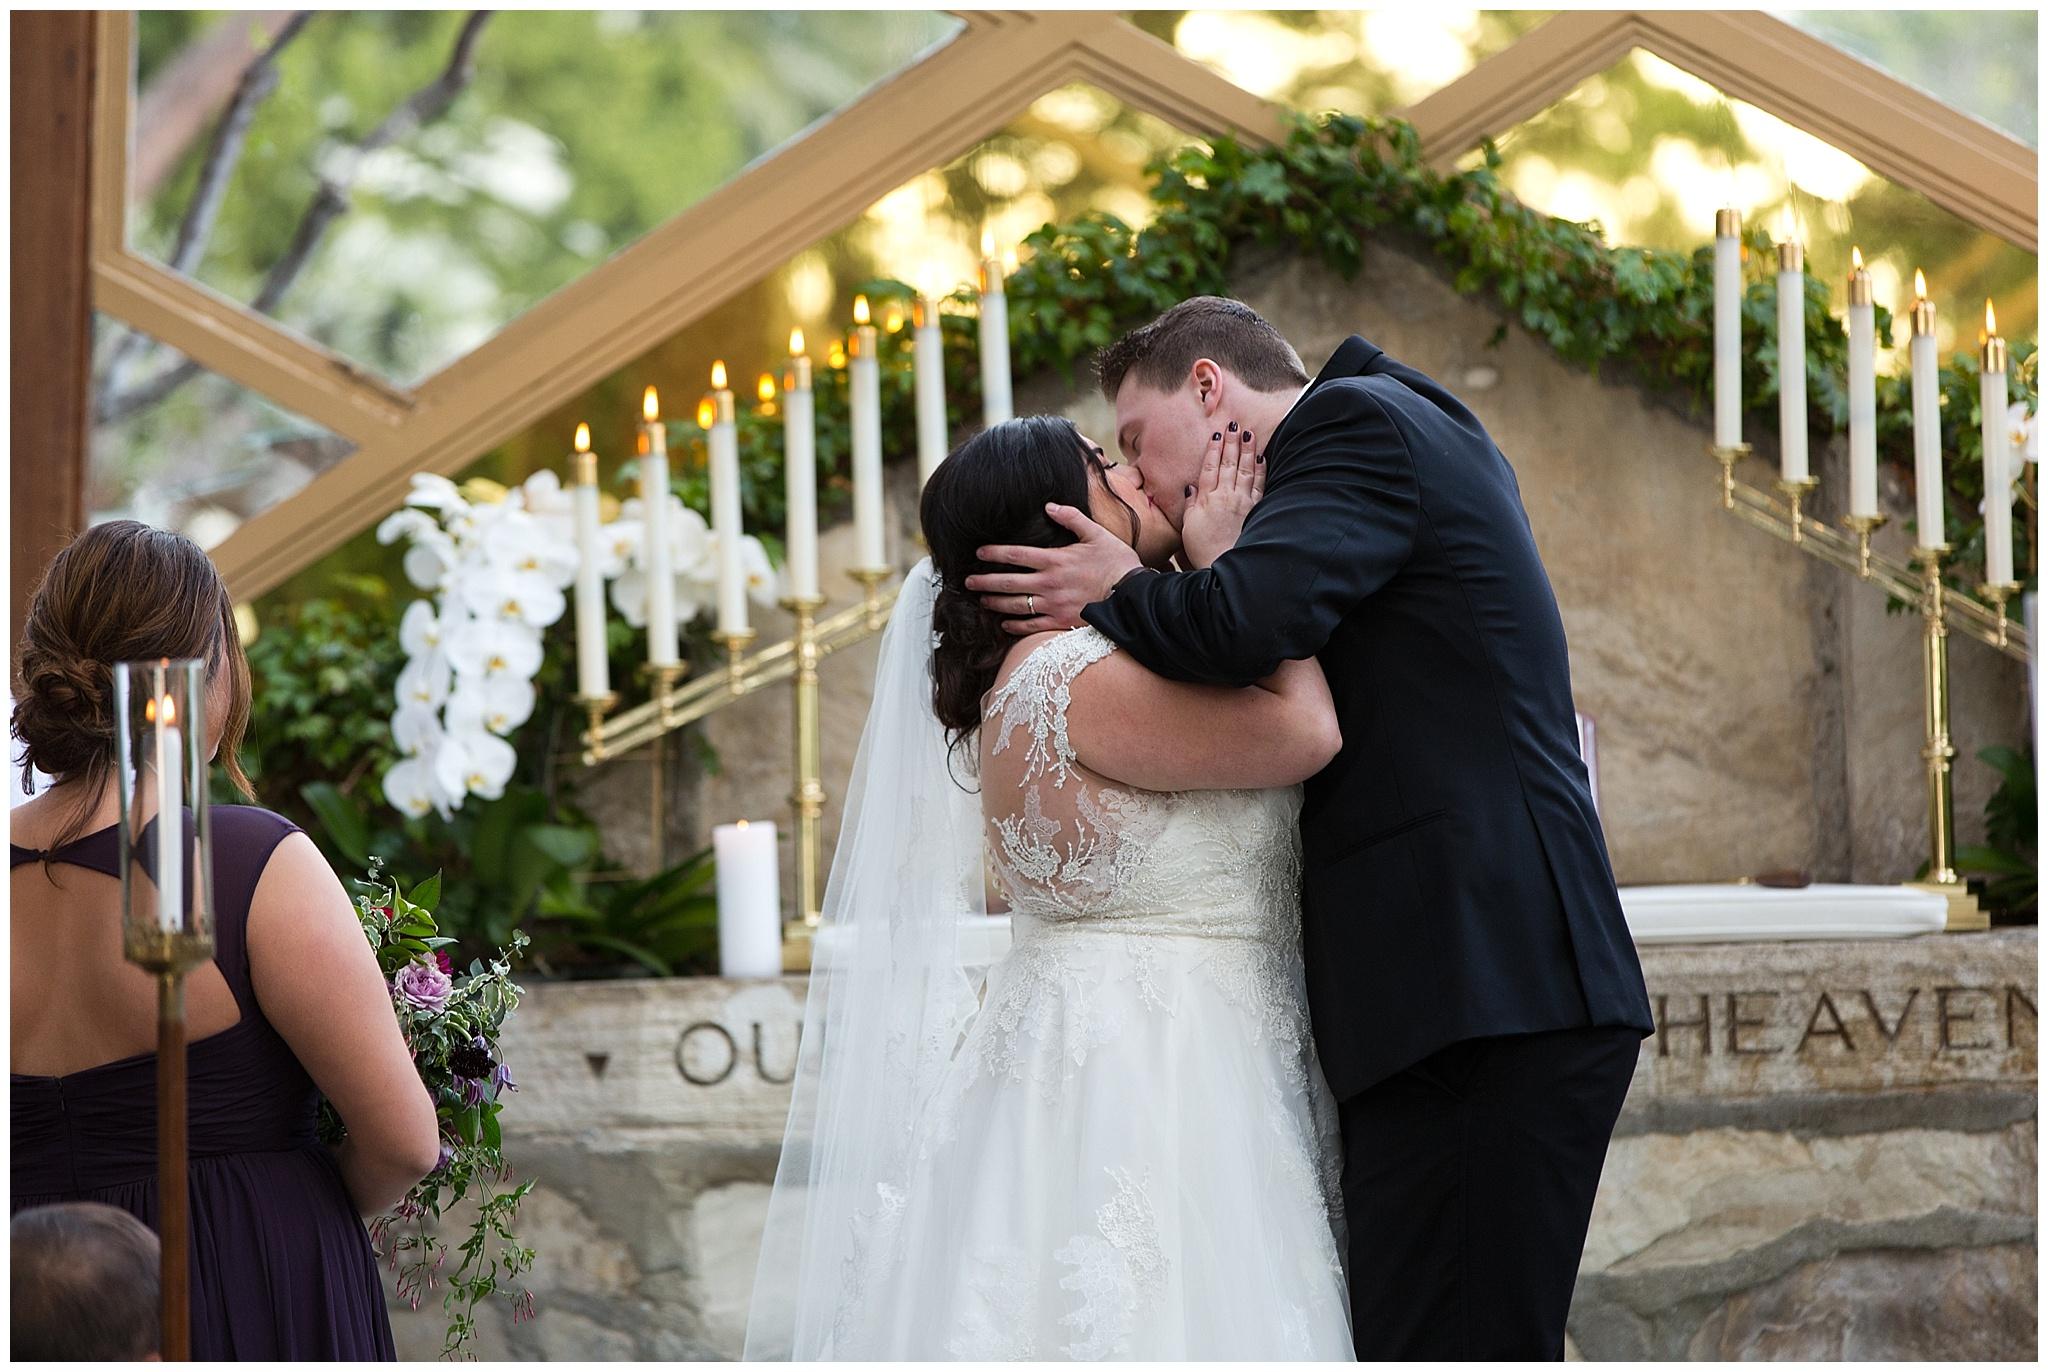 Carol_and_Grant_Wedding_3-3-18-8253.jpg